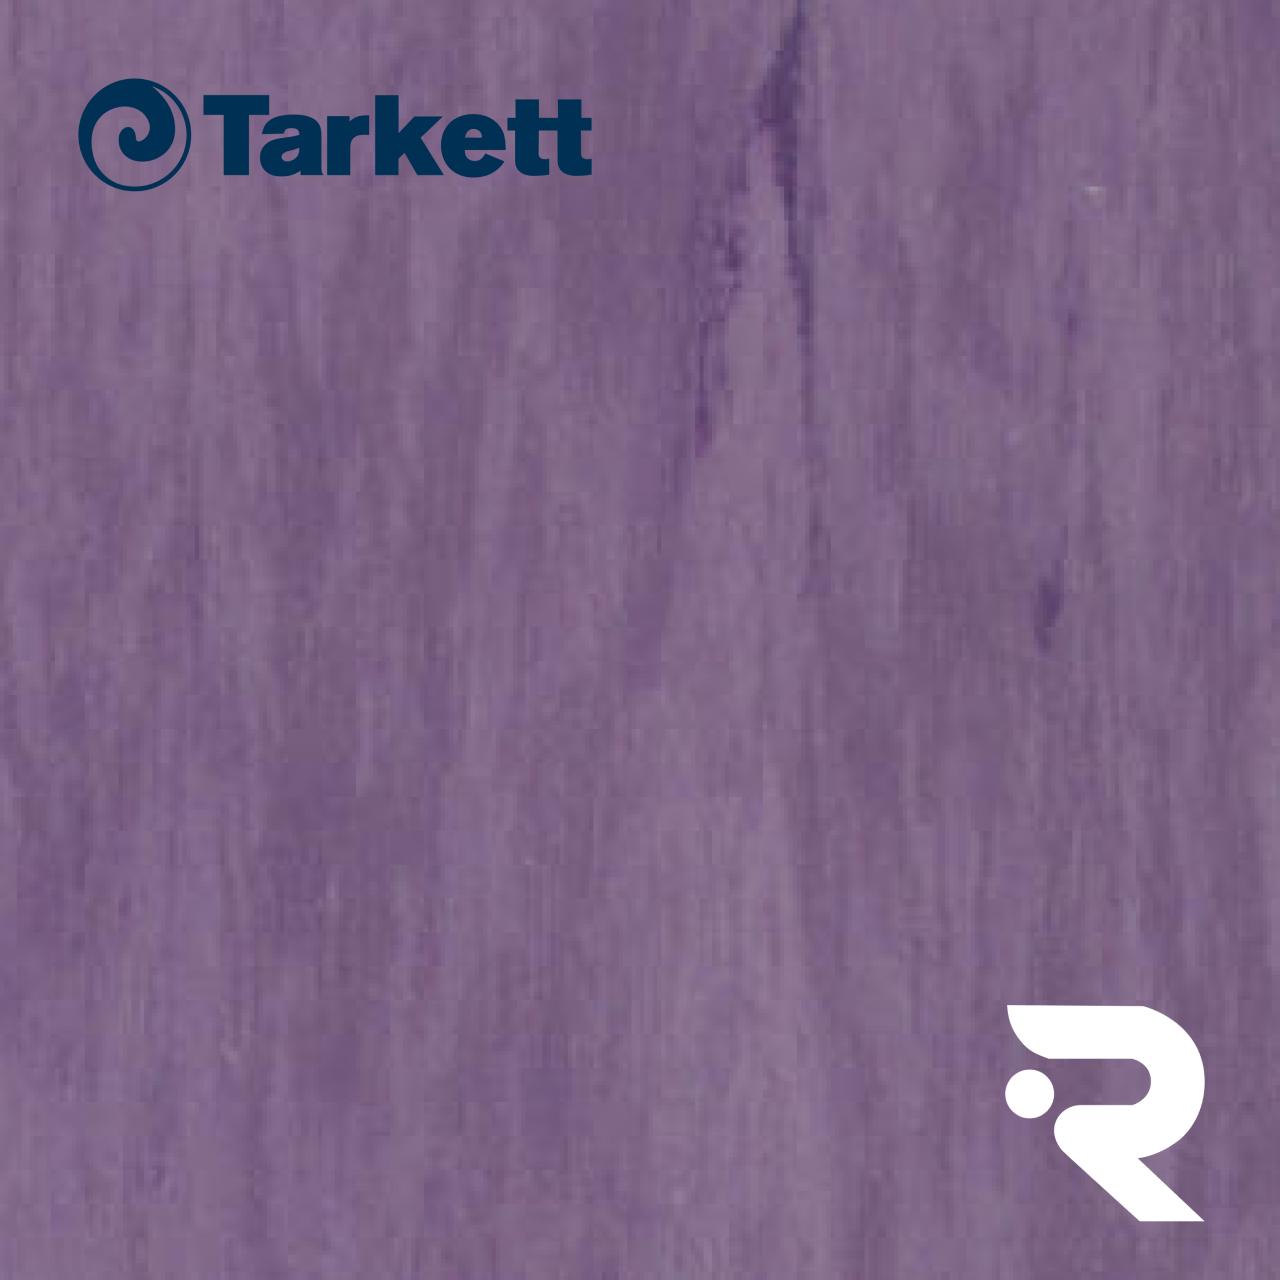 🏫 Гомогенный линолеум Tarkett | Standard PURPLE 0918 | Standard Plus 2.0 mm | 2 х 23 м